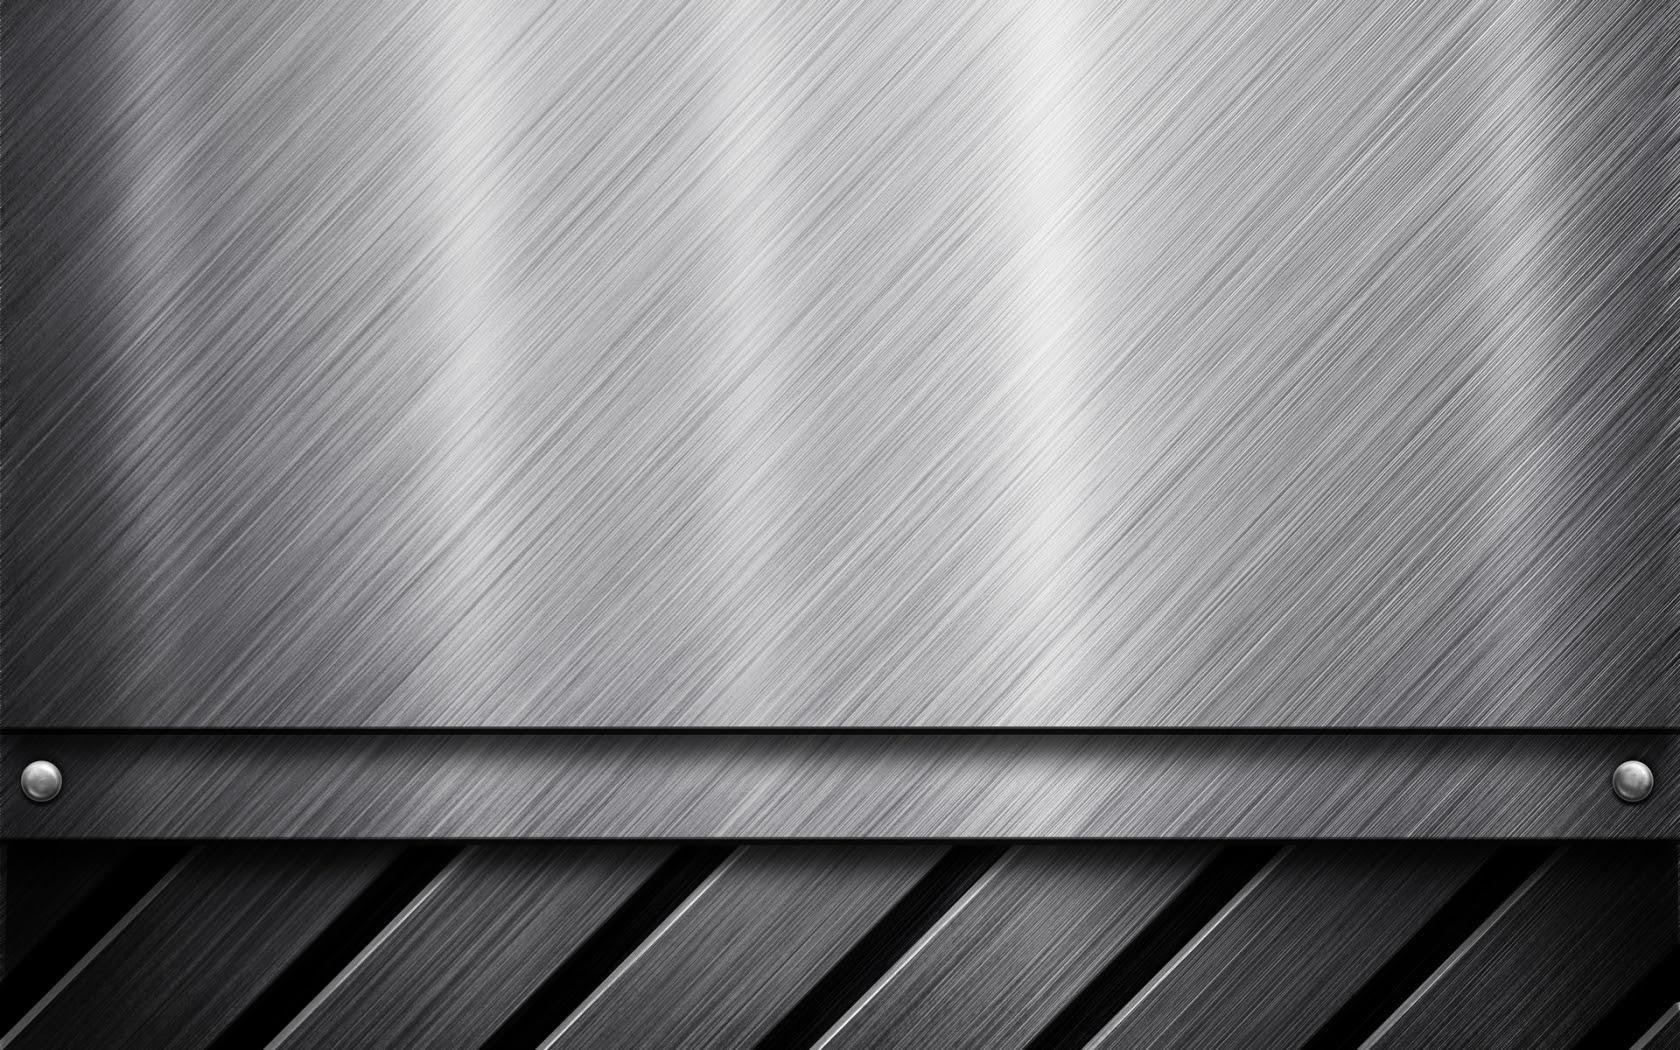 Unduh 700+ Wallpaper Hd Black Metallic HD